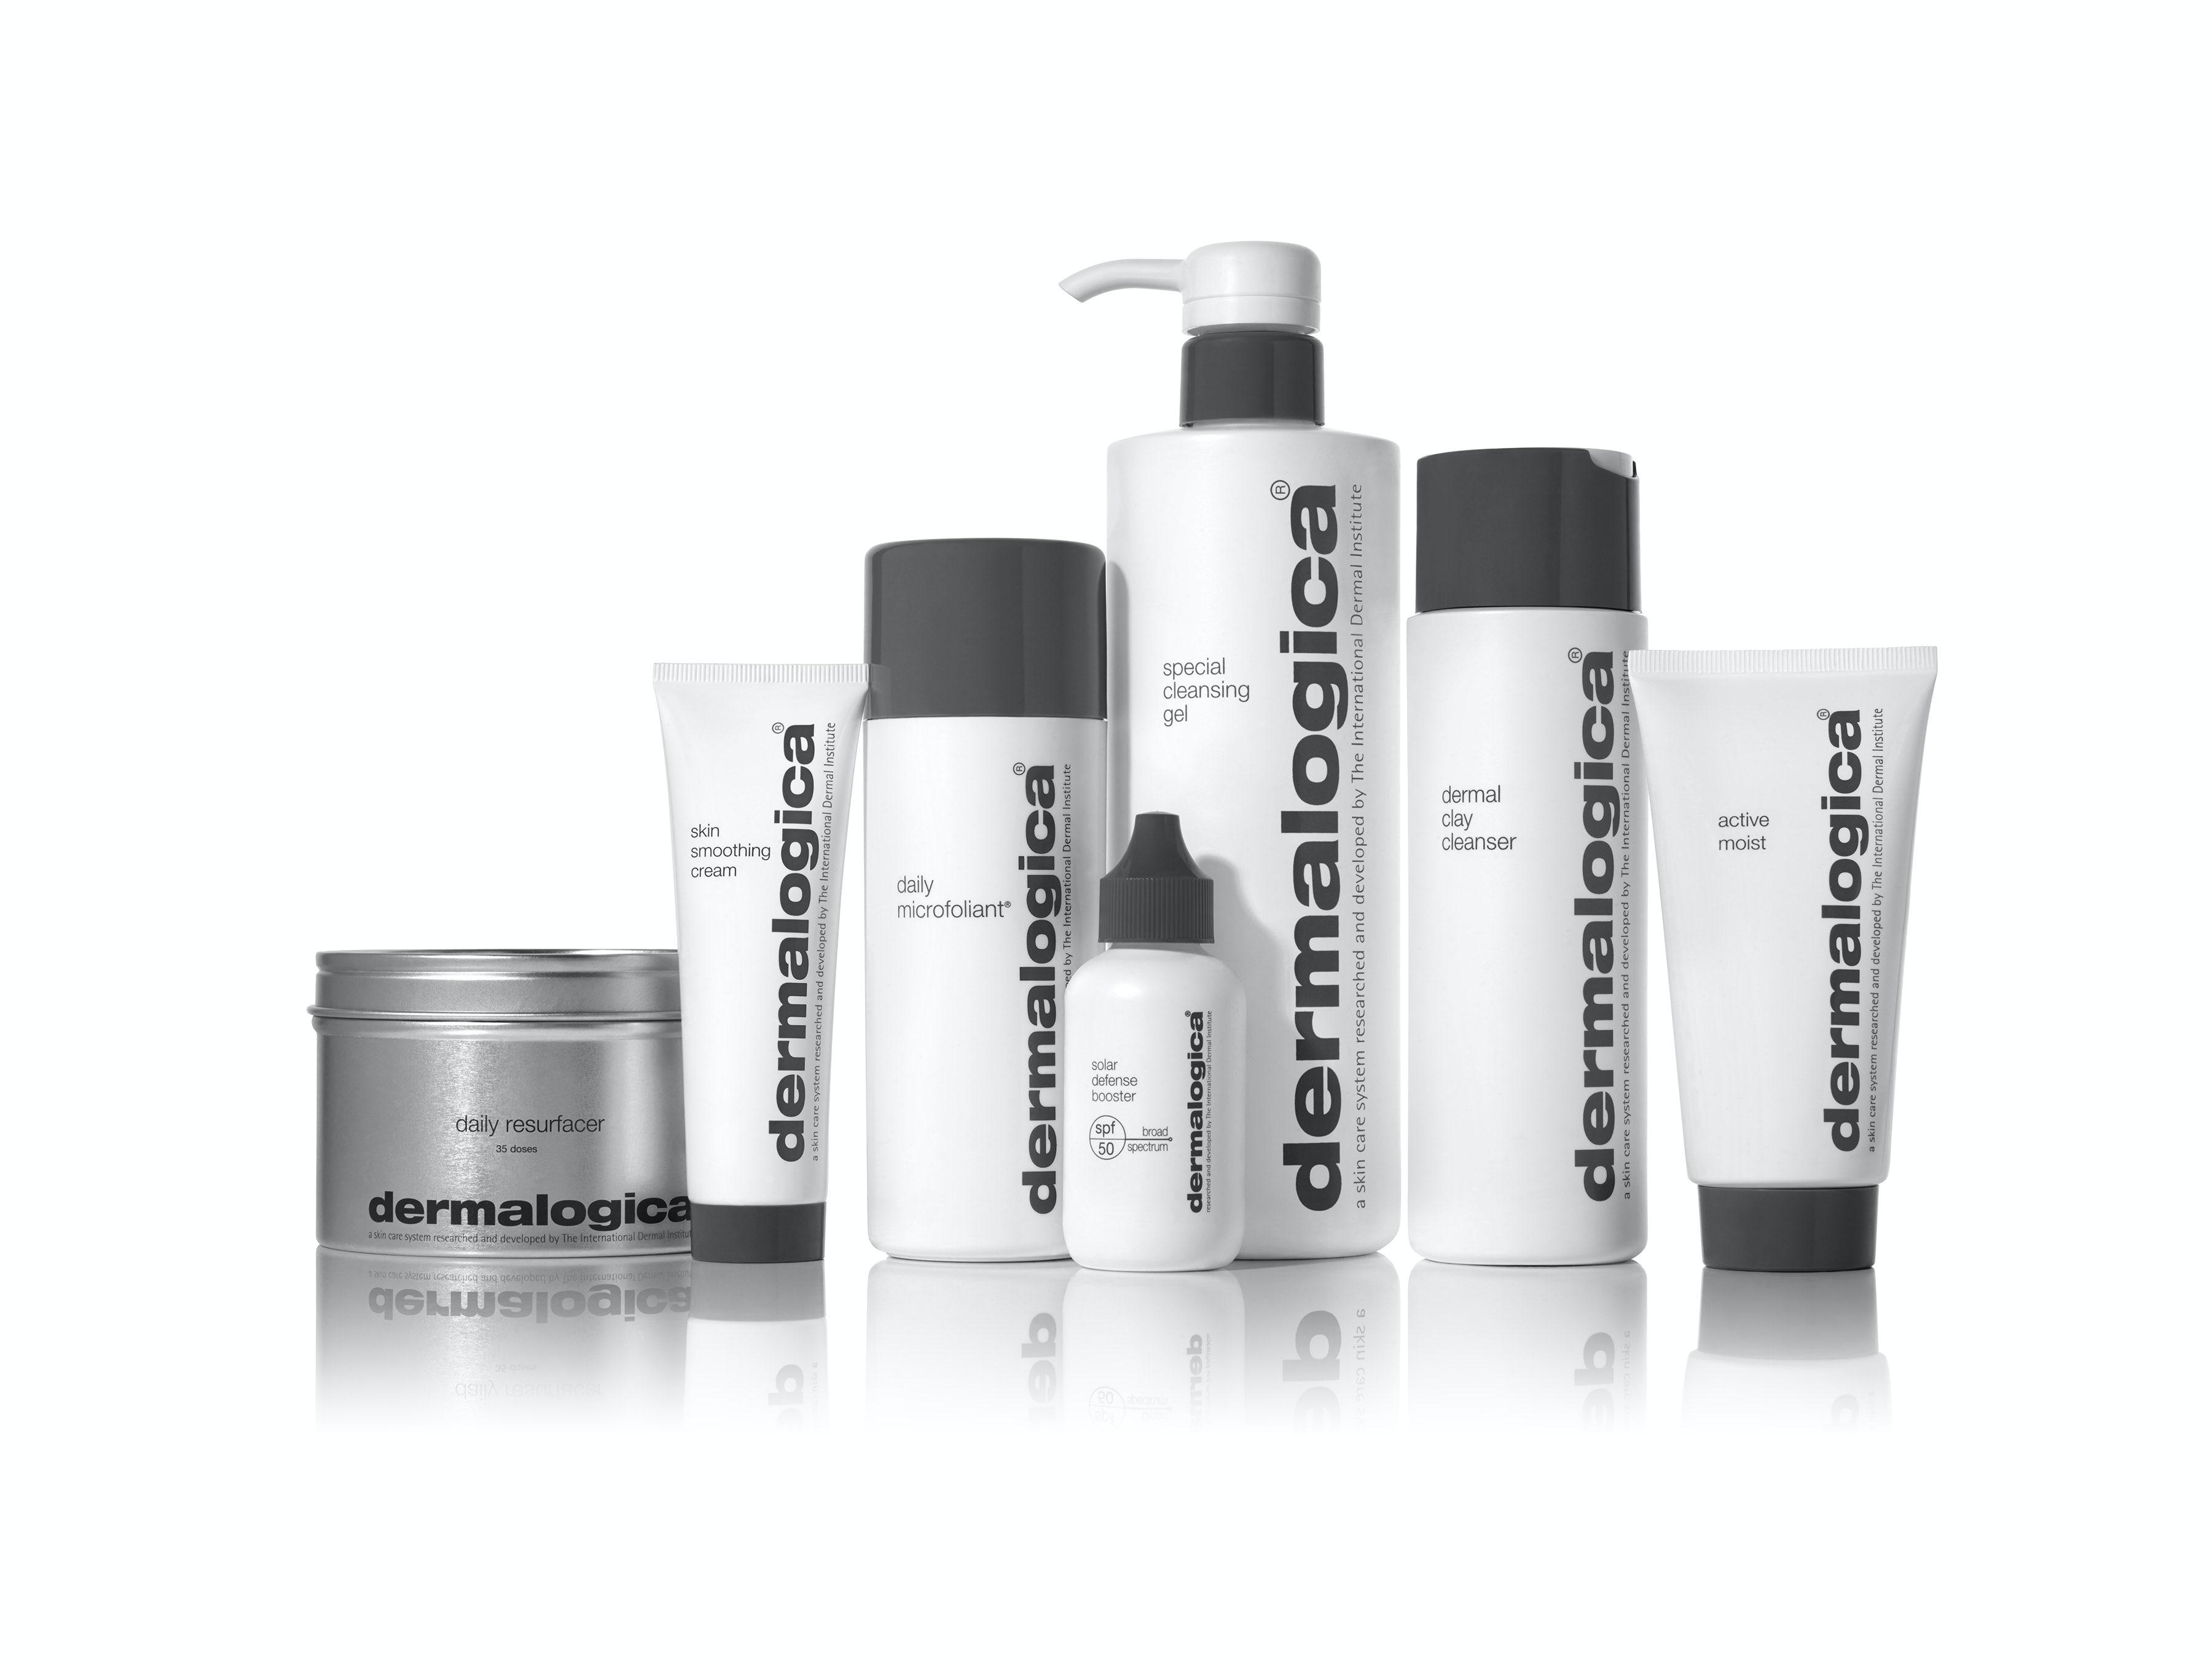 Professional Skin Care Brands Uk